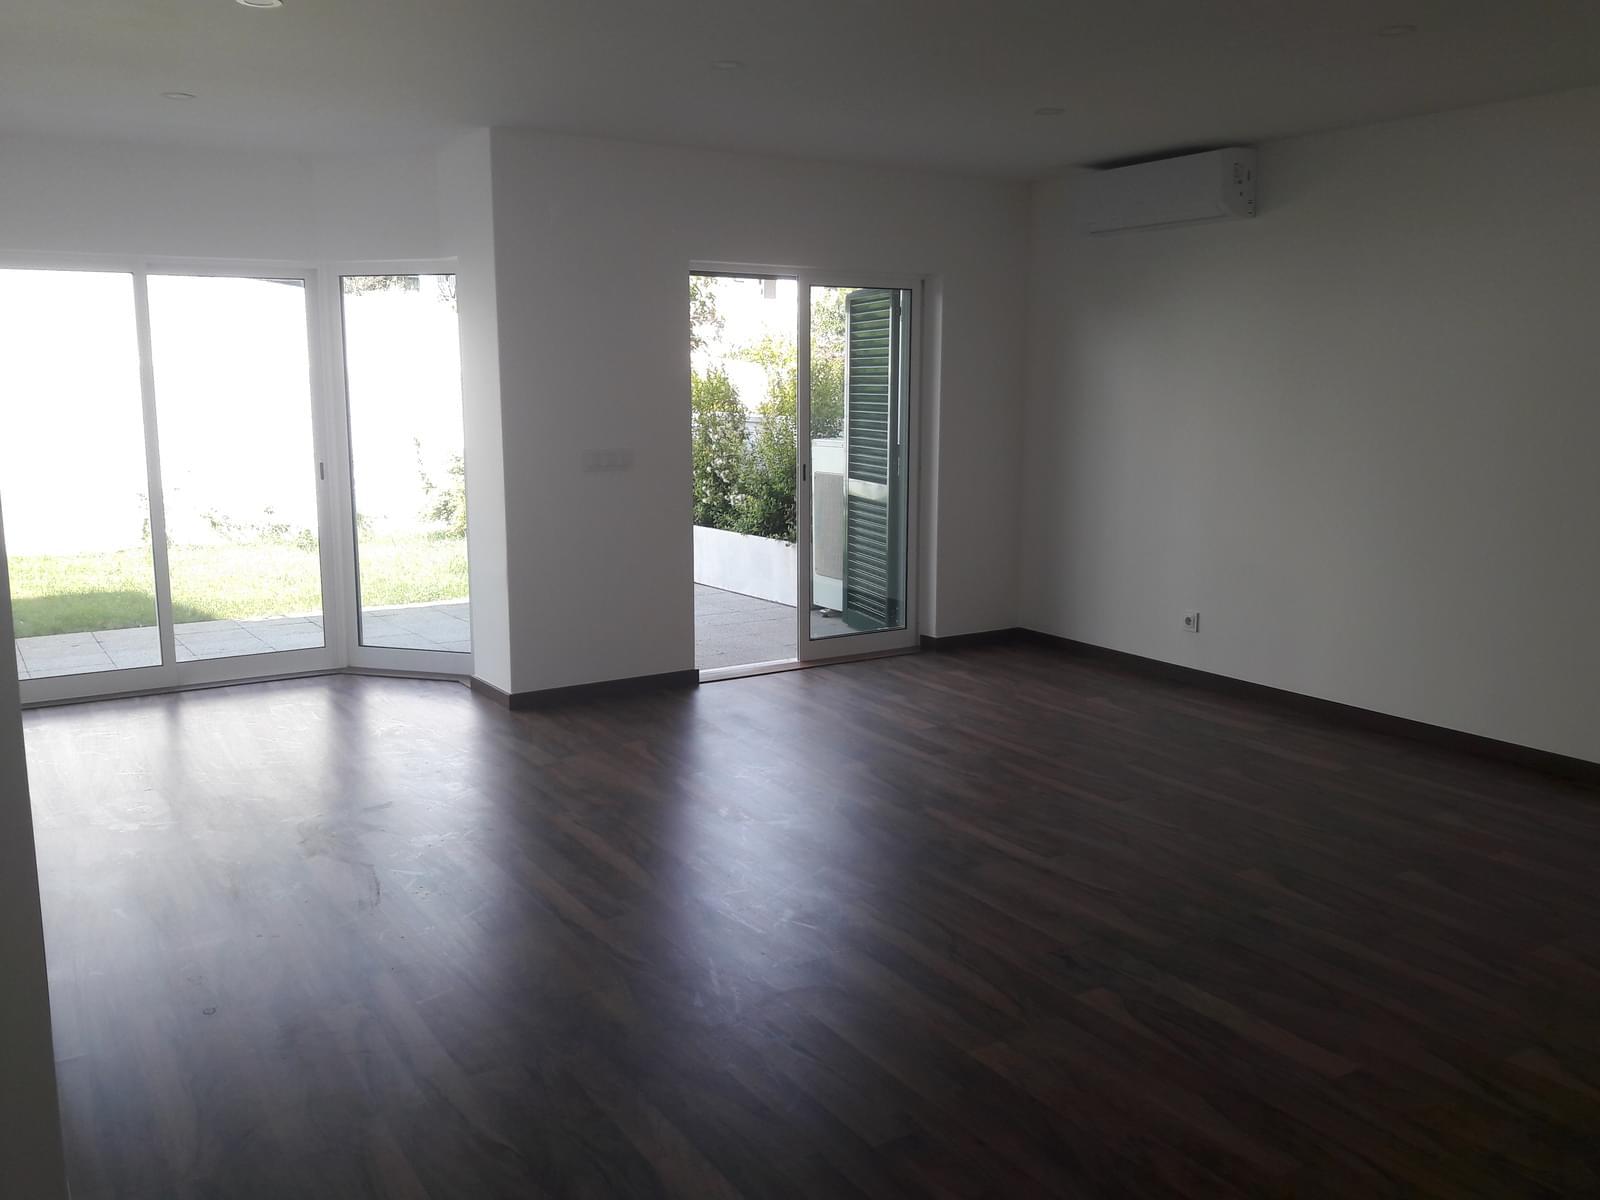 pf18025-apartamento-t3-bf0f06a3-e433-4df1-831b-cd6d3024b3de